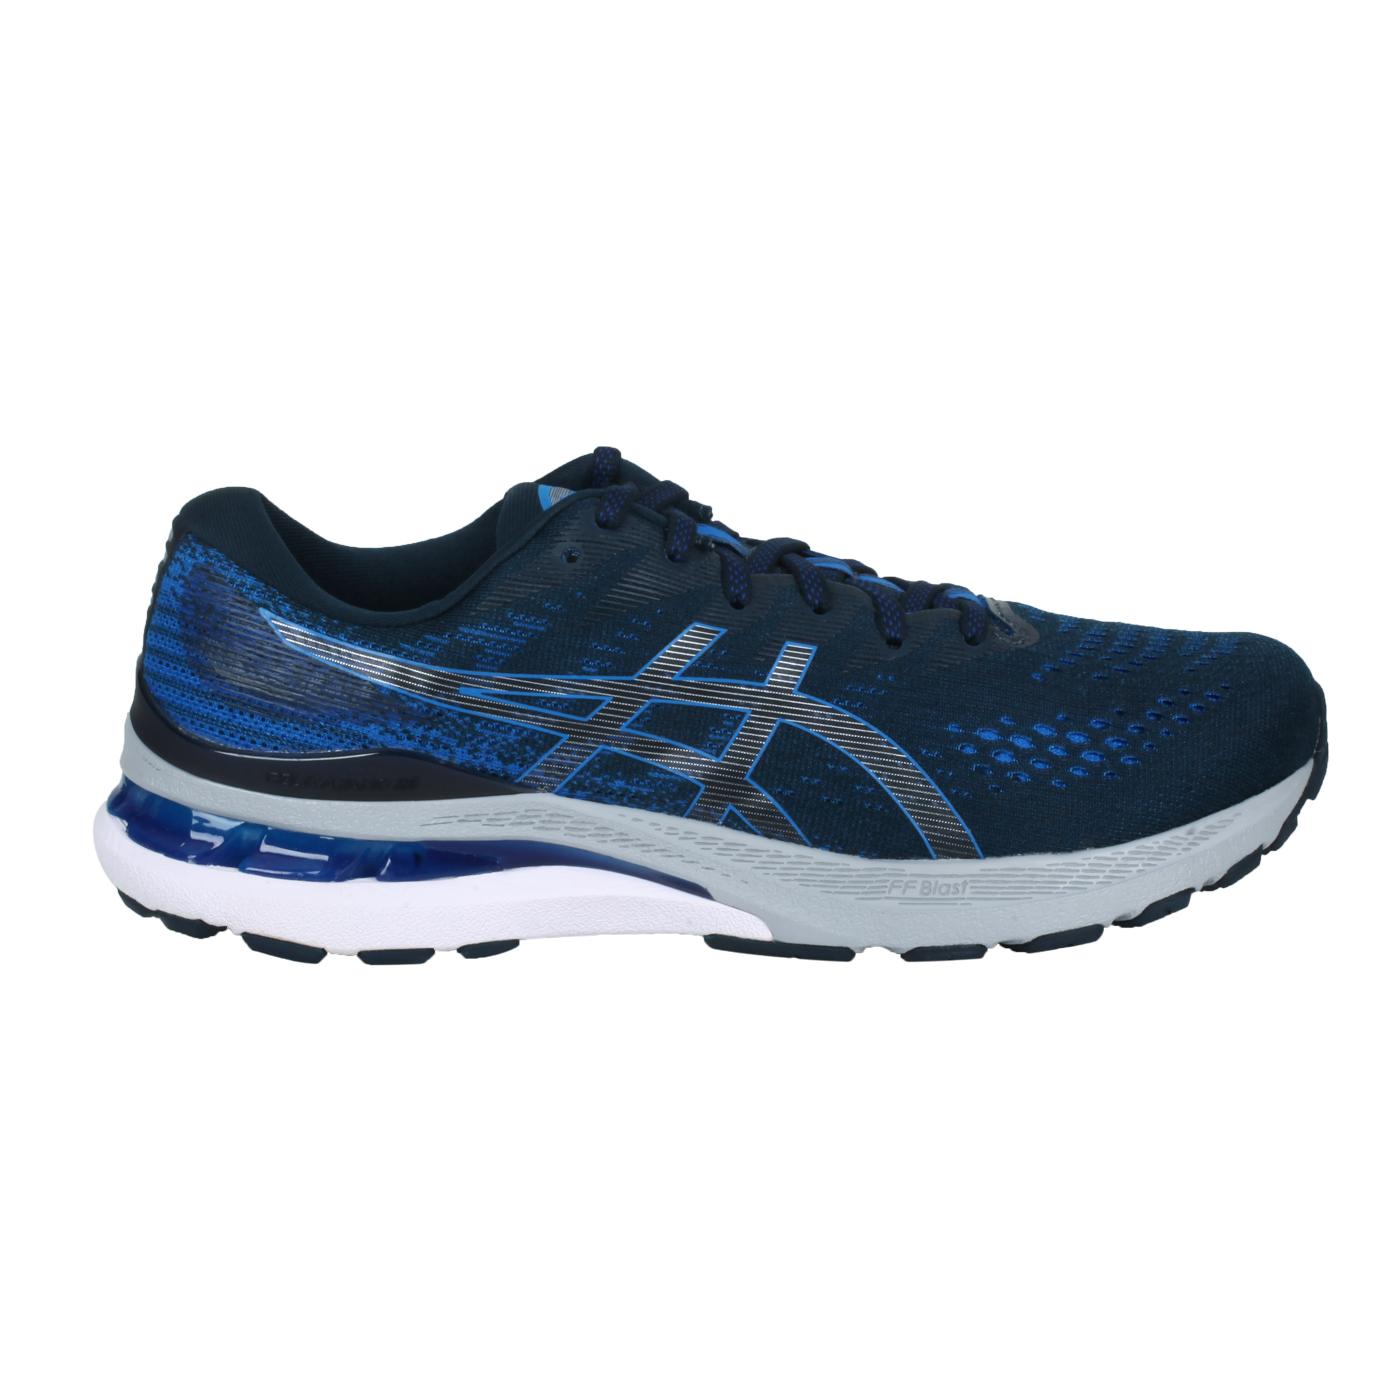 ASICS 男款慢跑鞋-2E  @GEL-KAYANO 28@1011B188-400 - 藍銀